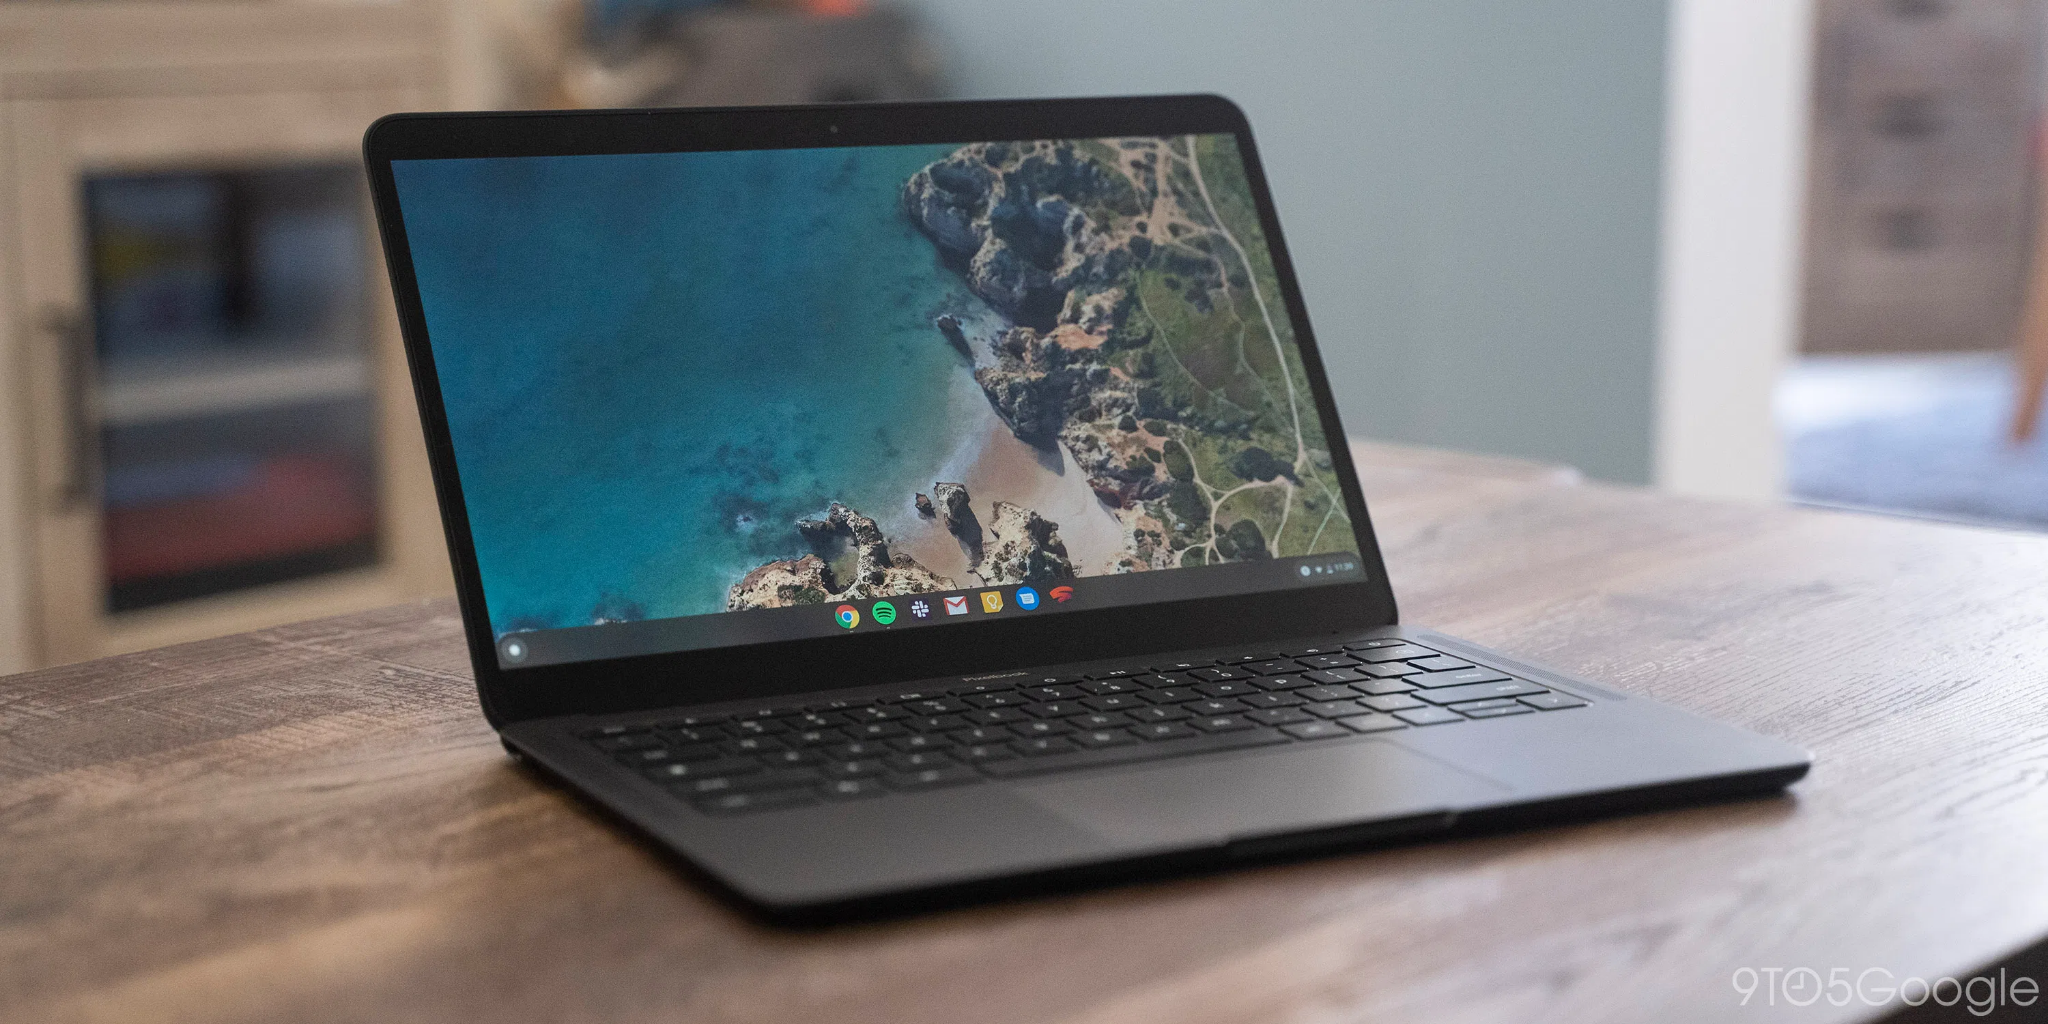 Google Pixelbook Go, BEST STUDENT LAPTOPS FOR STUDYING